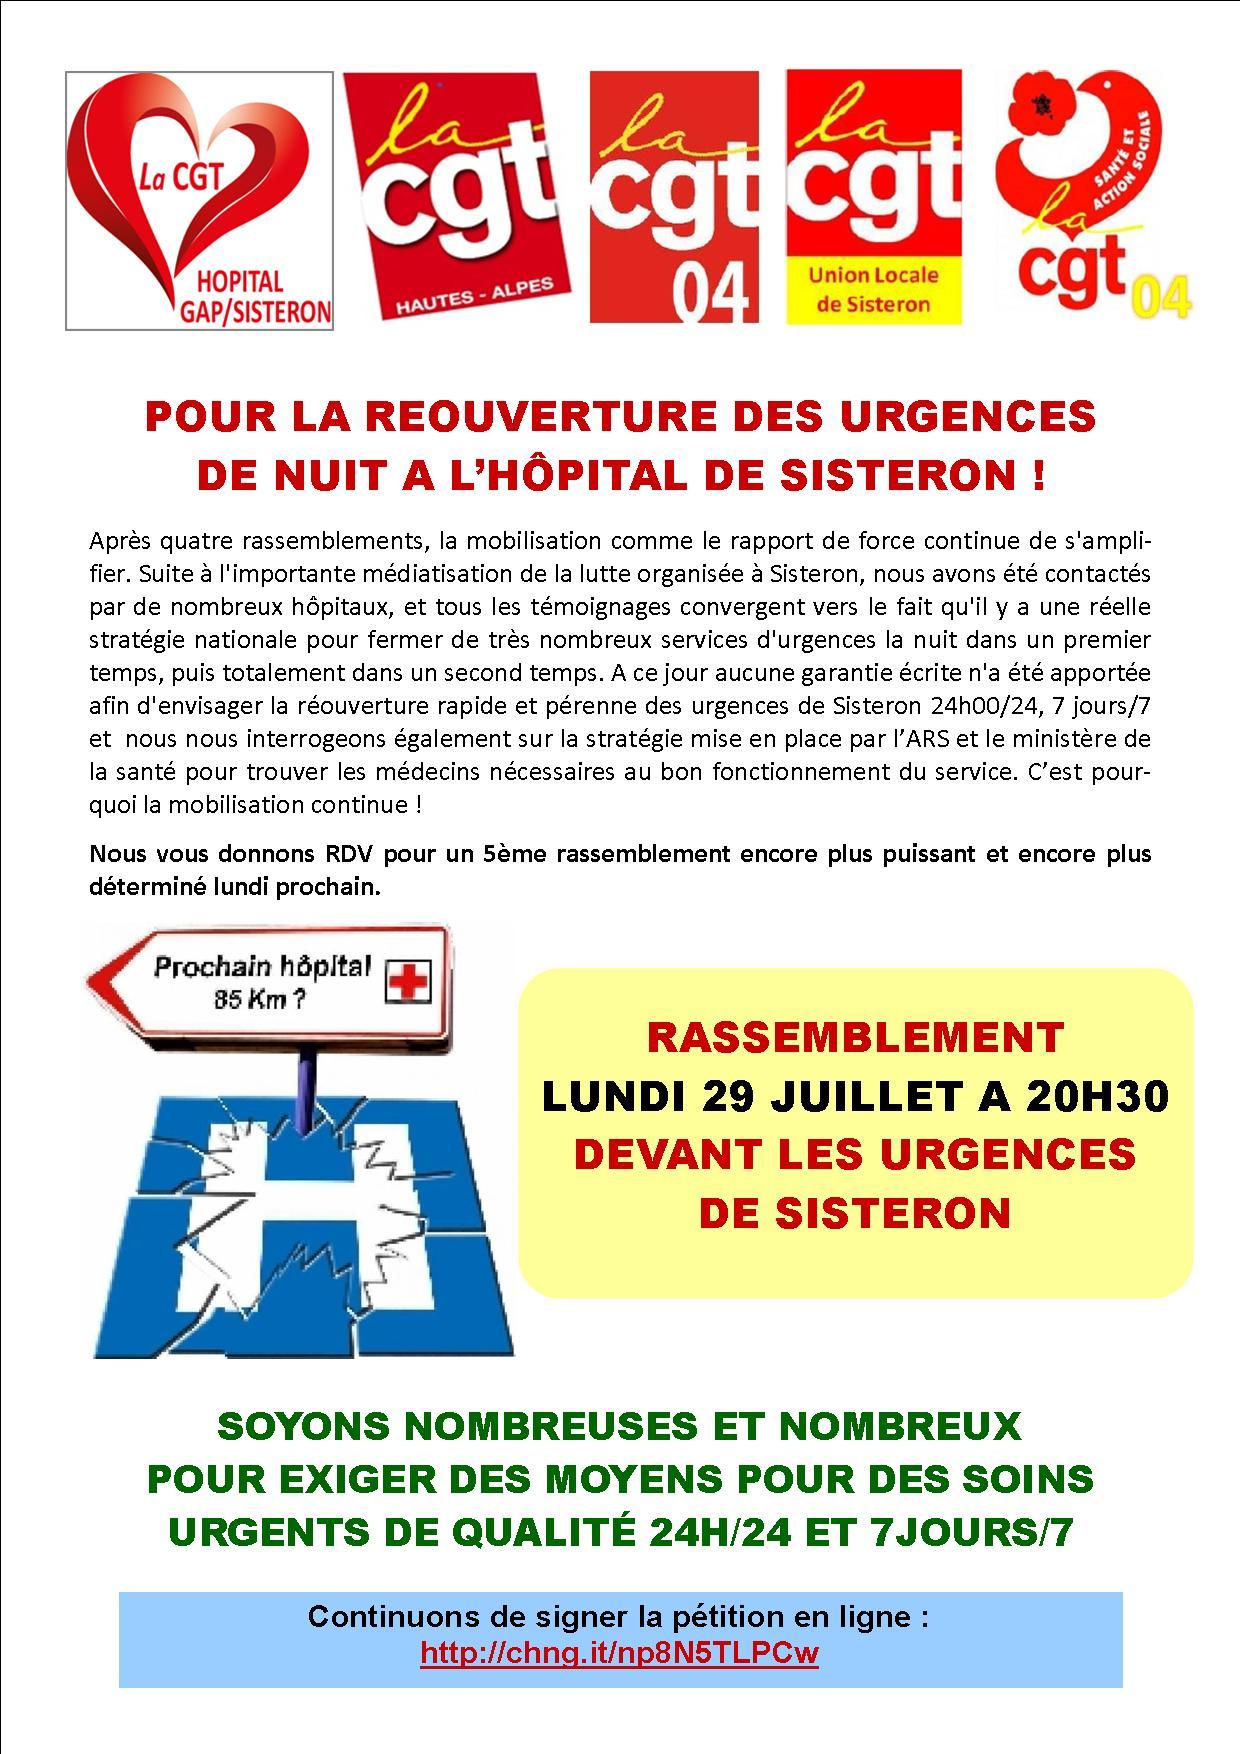 Tract fermeture urgences Sisteron rassemblement 29 juillet